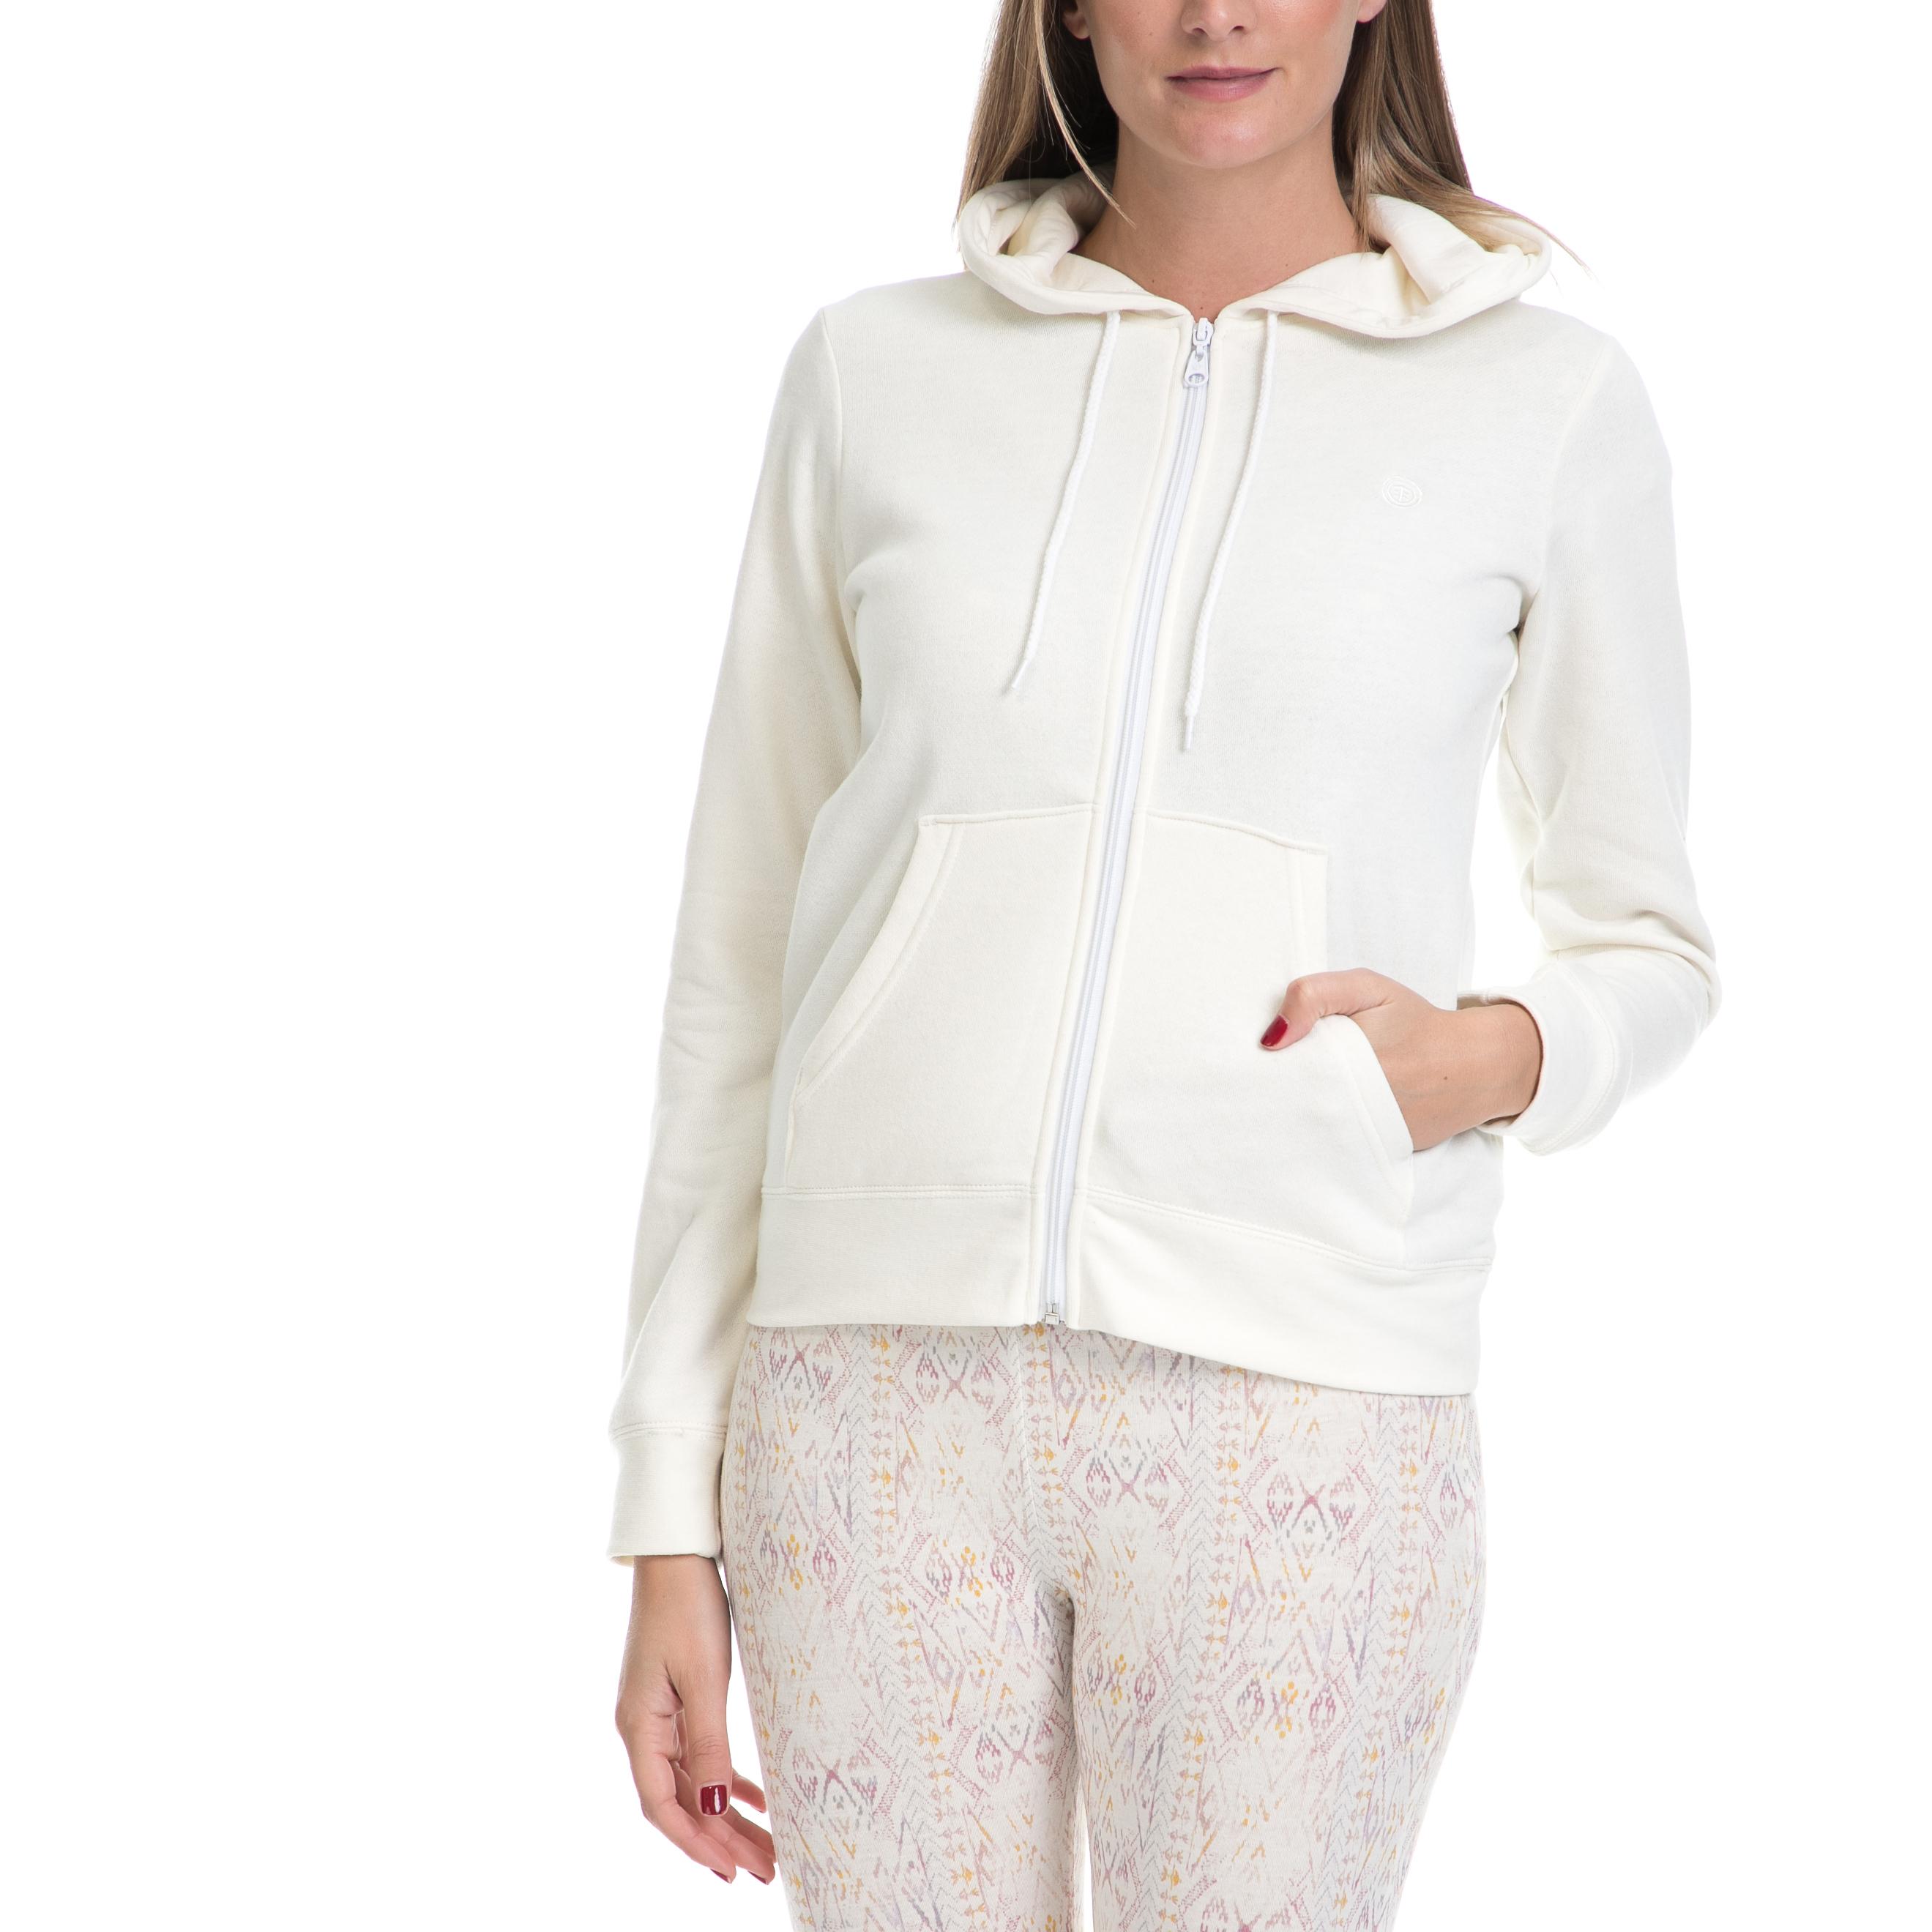 ELEMENT - Γυναικεία ζακέτα ELEMENT ERIN λευκή γυναικεία ρούχα πλεκτά ζακέτες ζακέτες